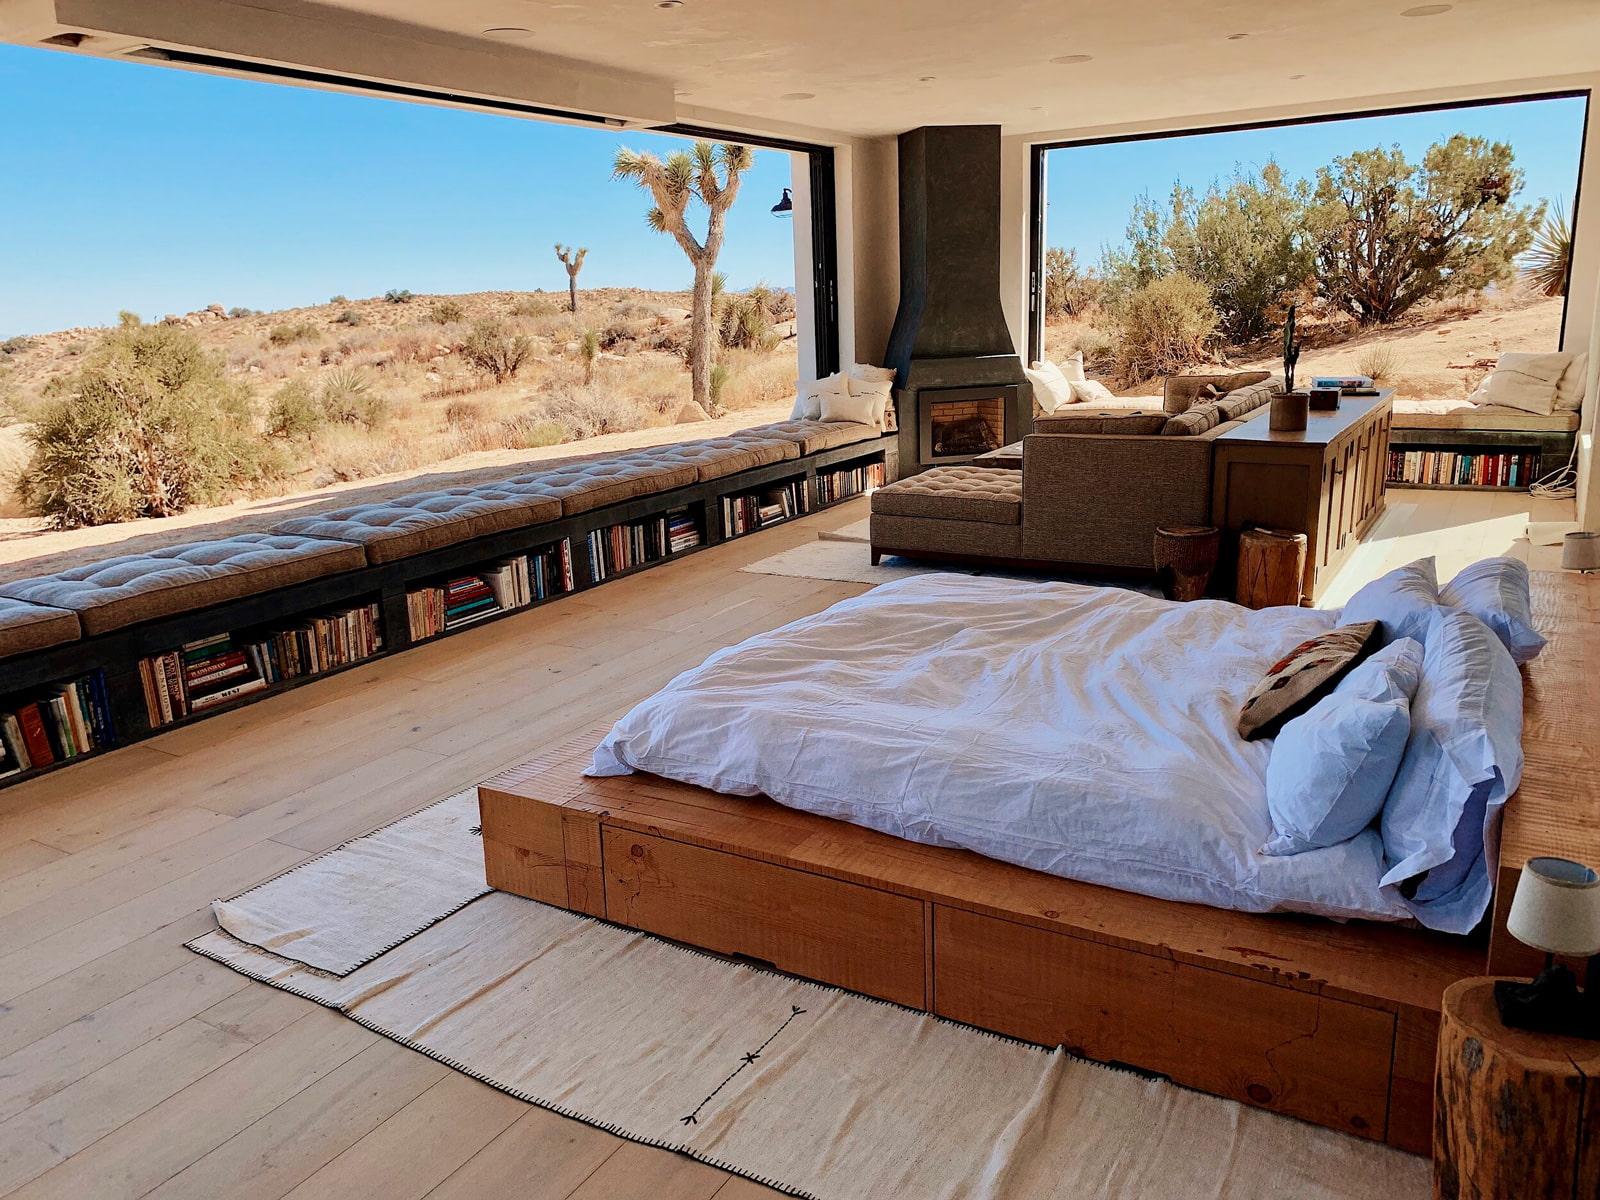 Joshua Tree National Park Airbnb